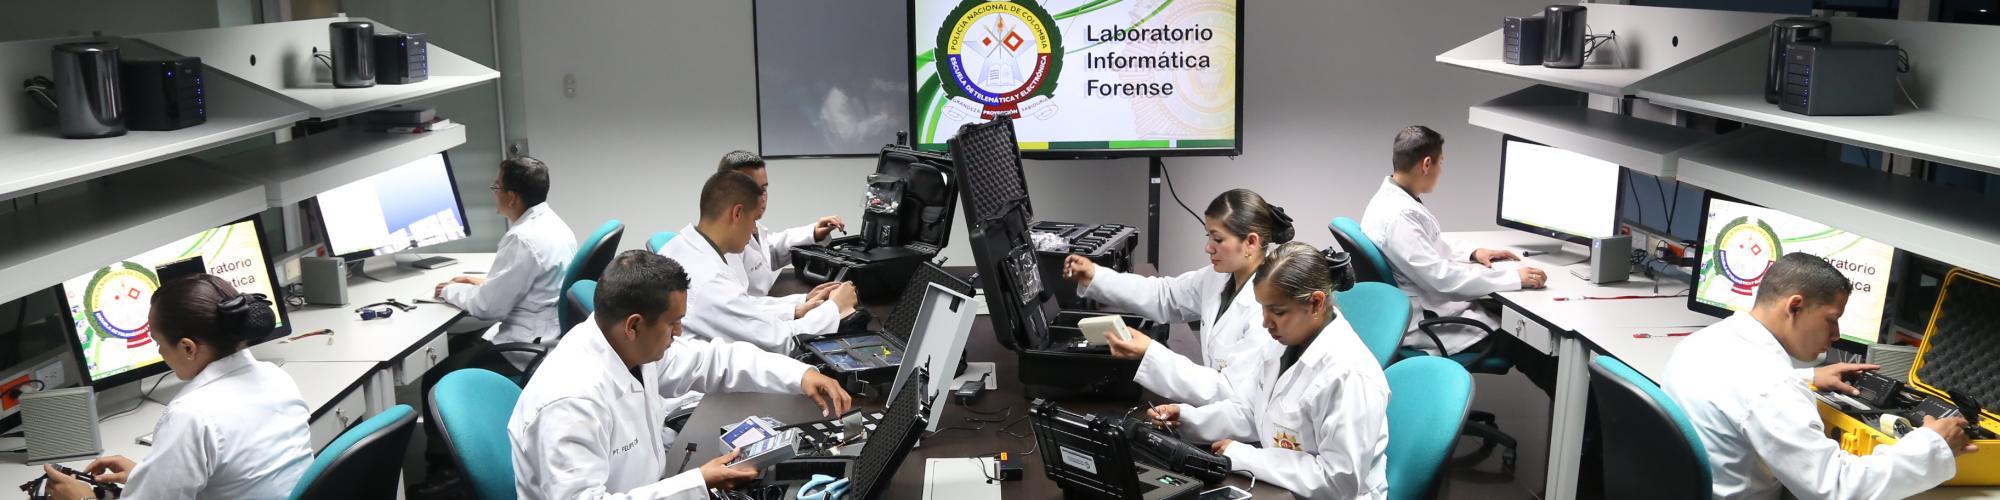 LABORATORIO DE INFORMÁTICA FORENSE